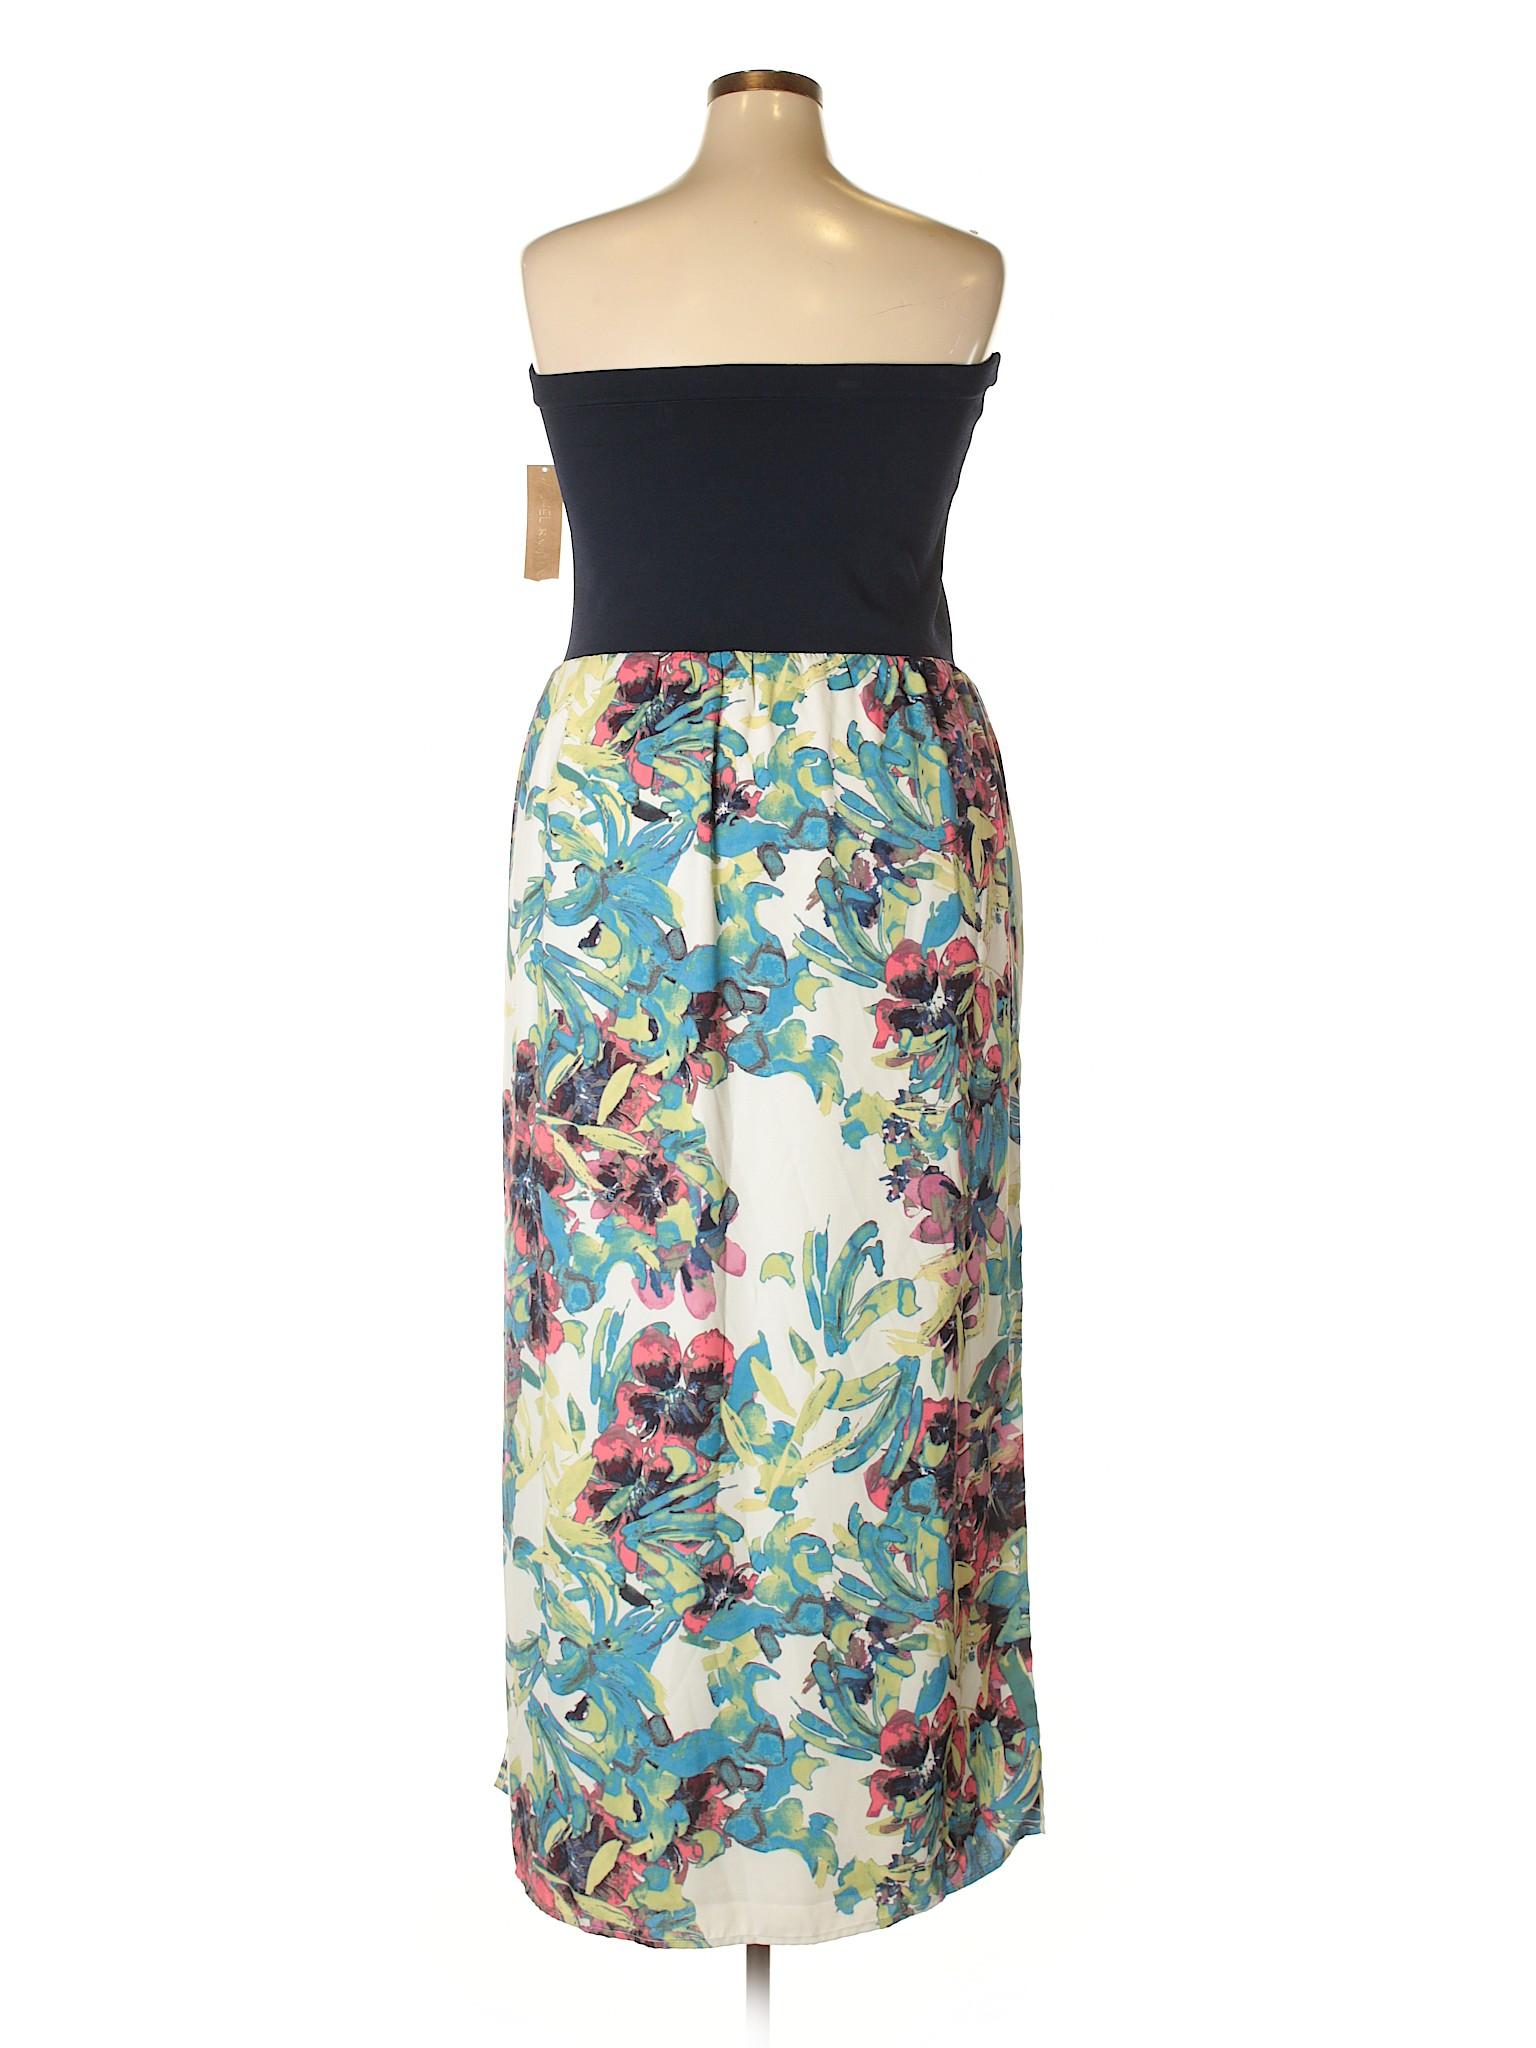 Dress RACHEL Roy Boutique winter Rachel Casual qgwwpPX